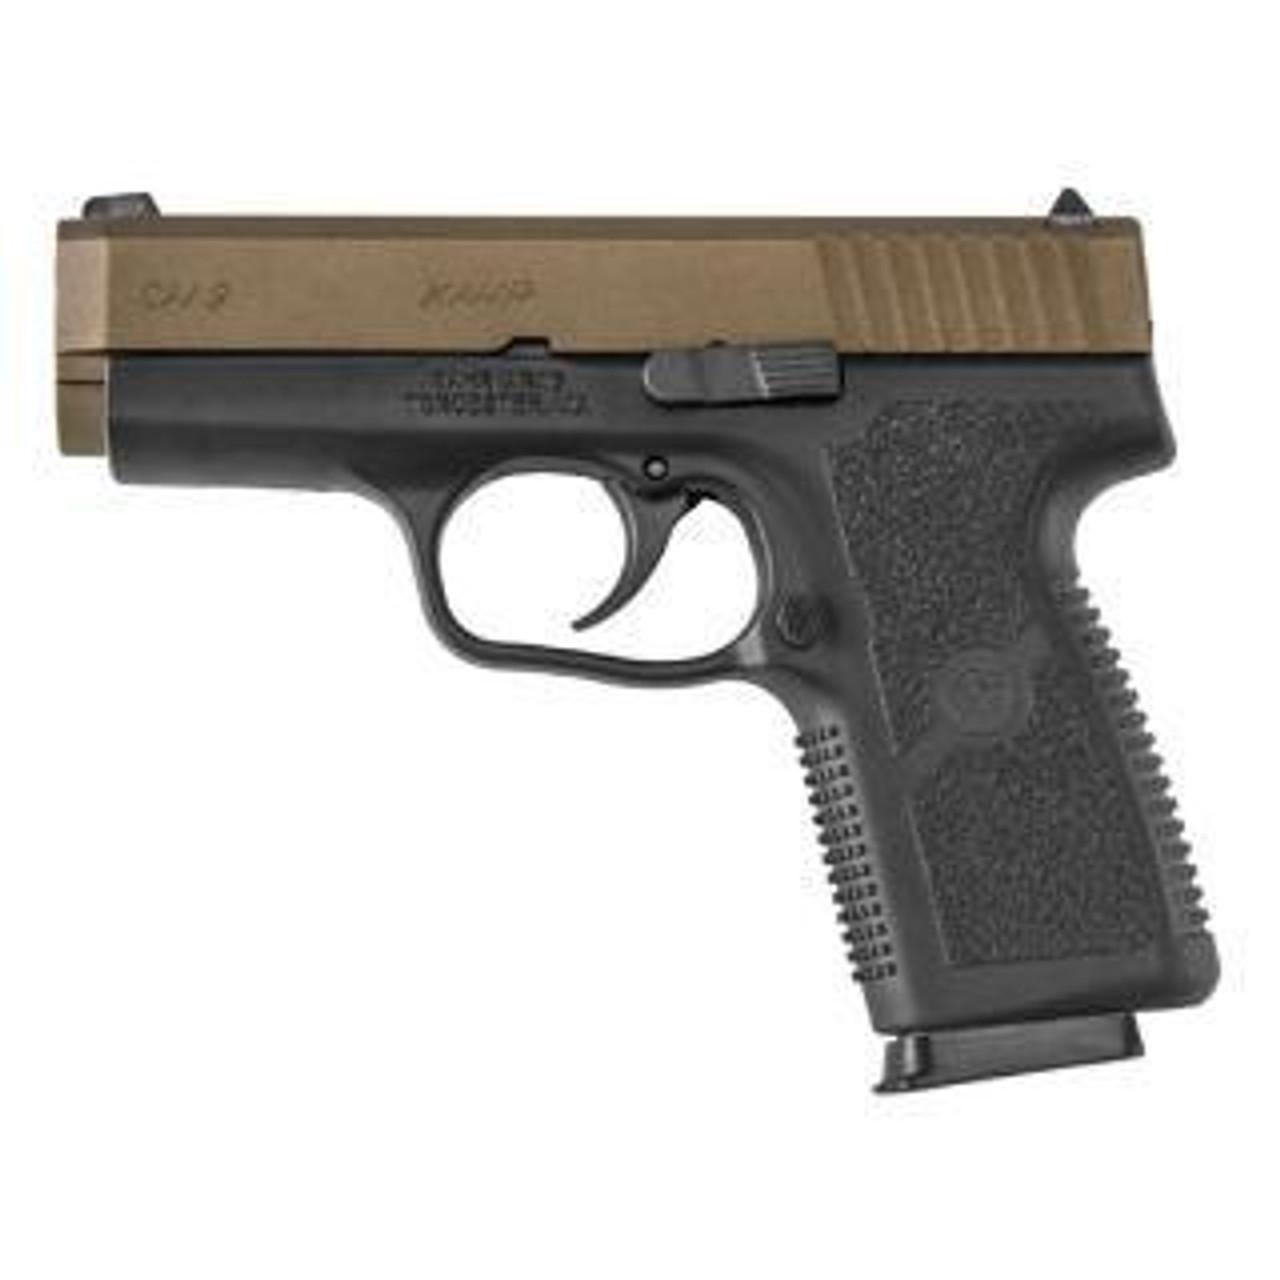 Kahr CW9 Burt Bronze CALIFORNIA LEGAL -9mm